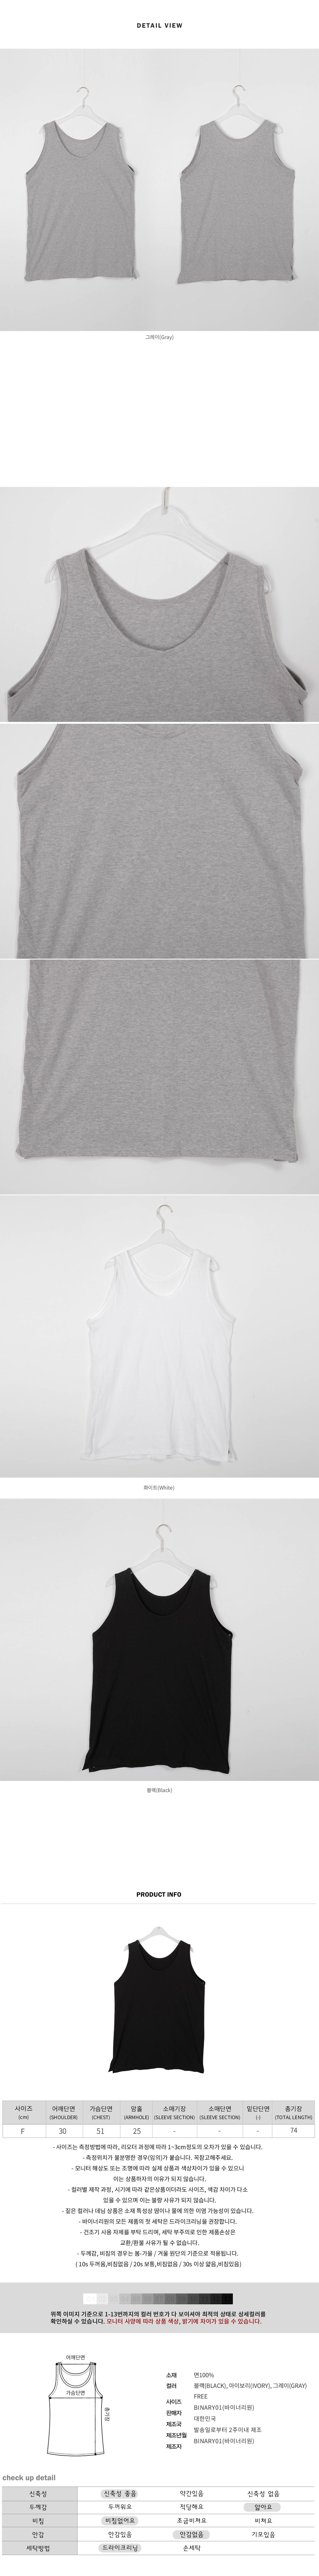 Layered Split Sleeveless T-shirt